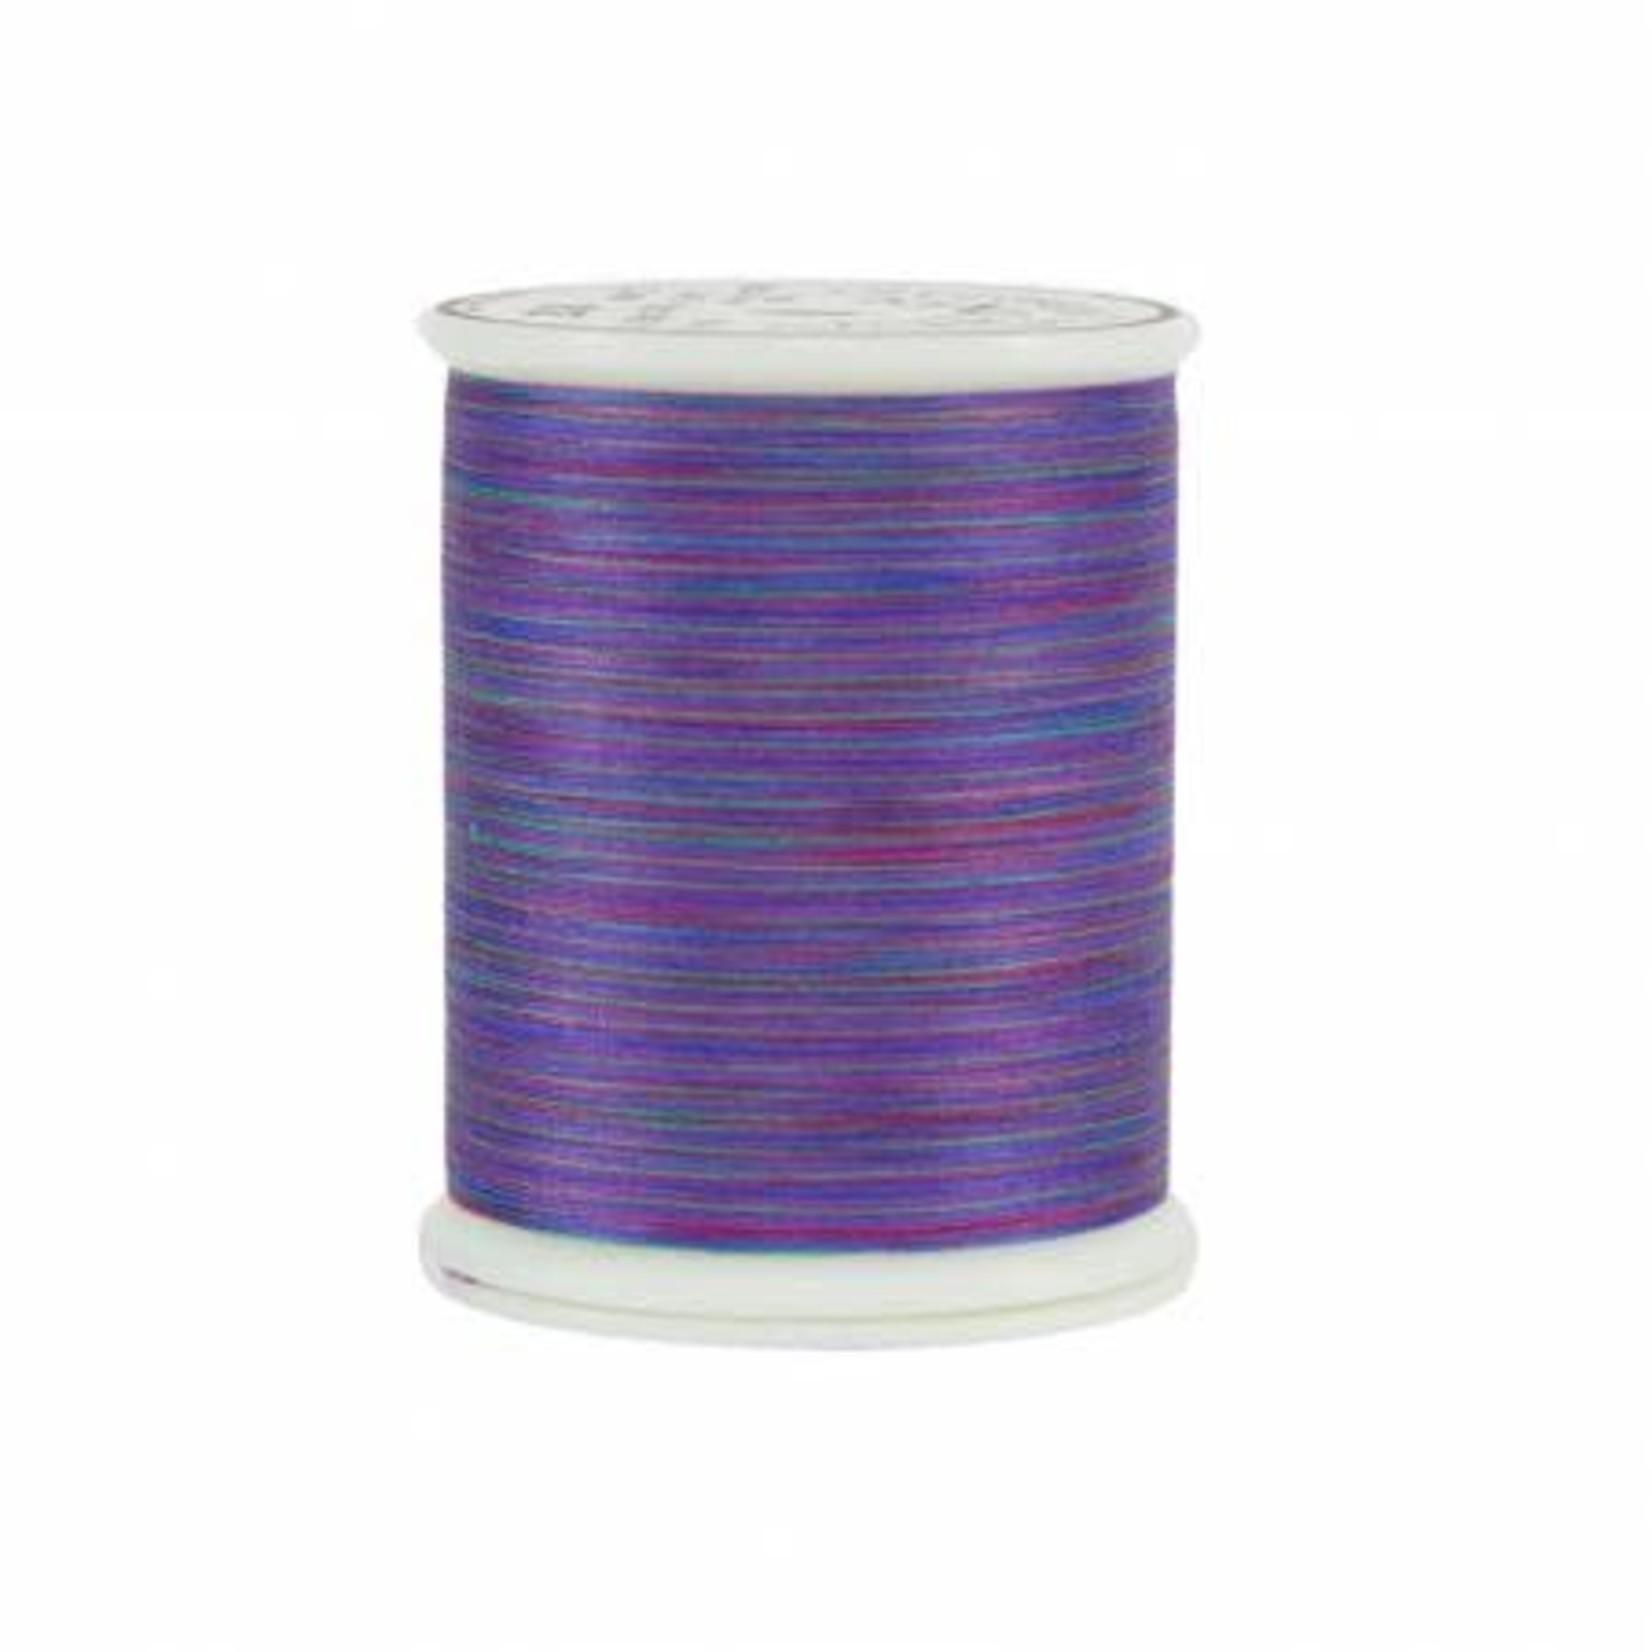 Superior Threads King Tut - #40 - 457 m - 0913 Jewel of the Nile